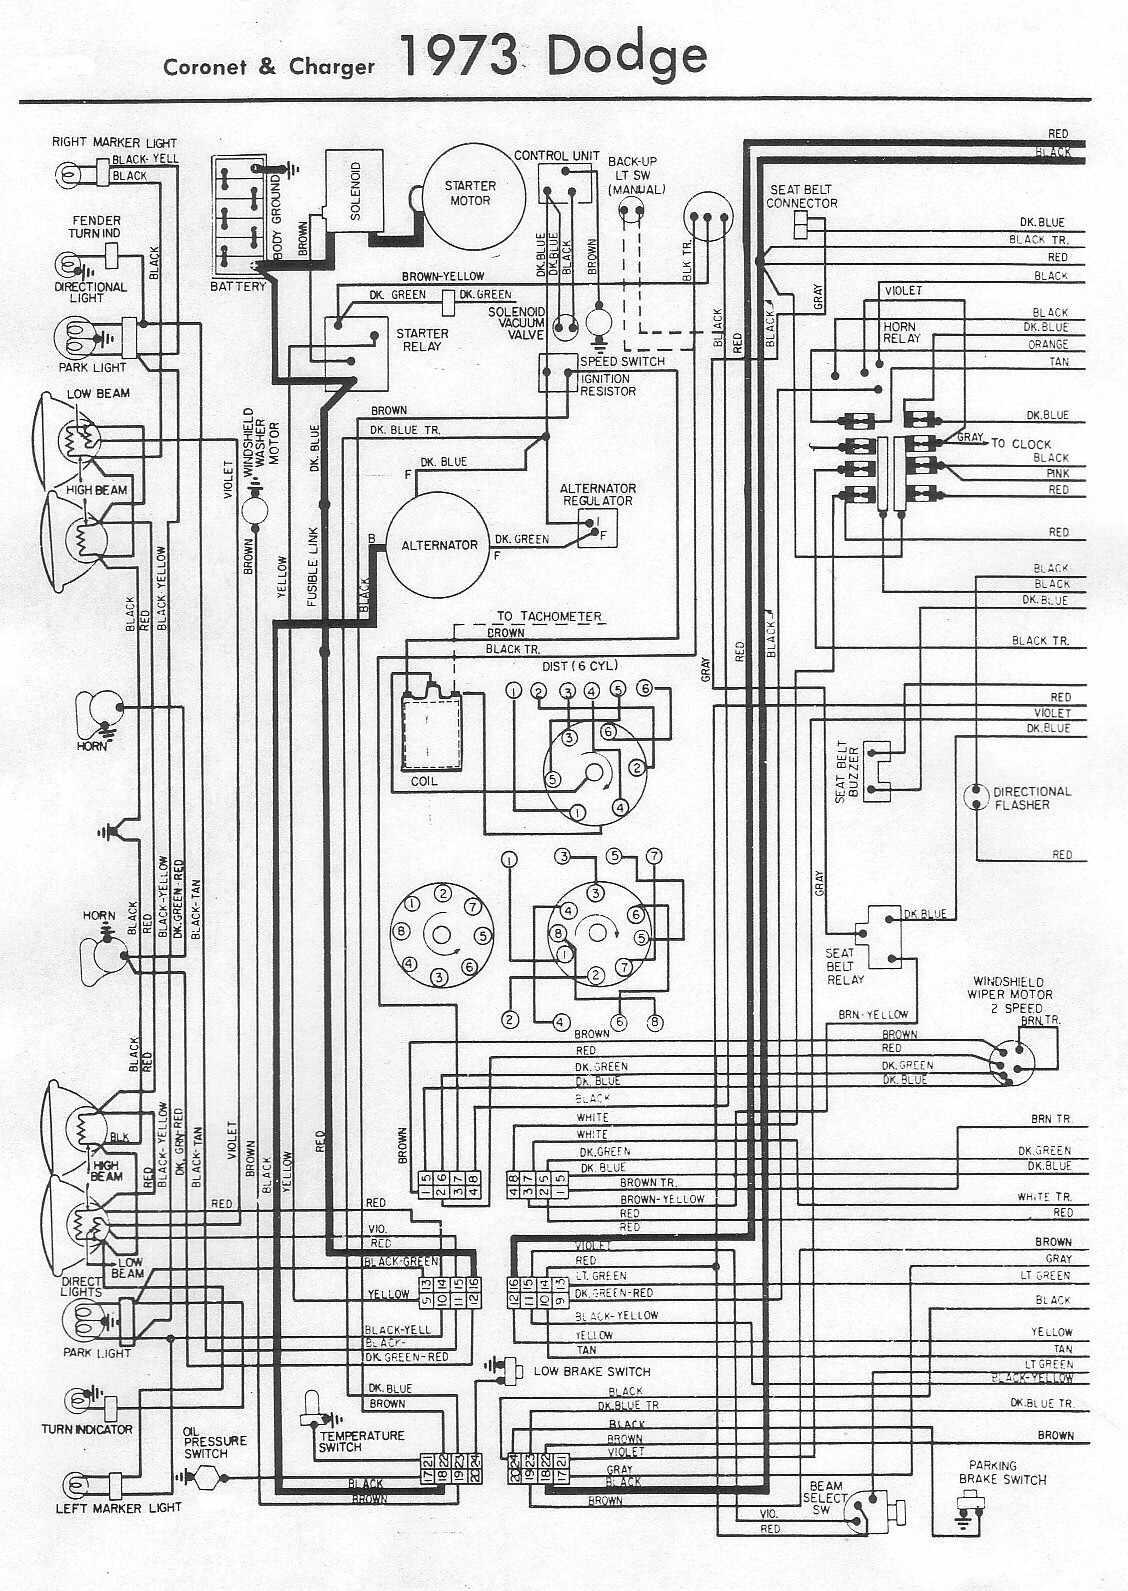 1973 dodge challenger wiring diagram for electronic distributor wiring diagram expert [ 1128 x 1591 Pixel ]